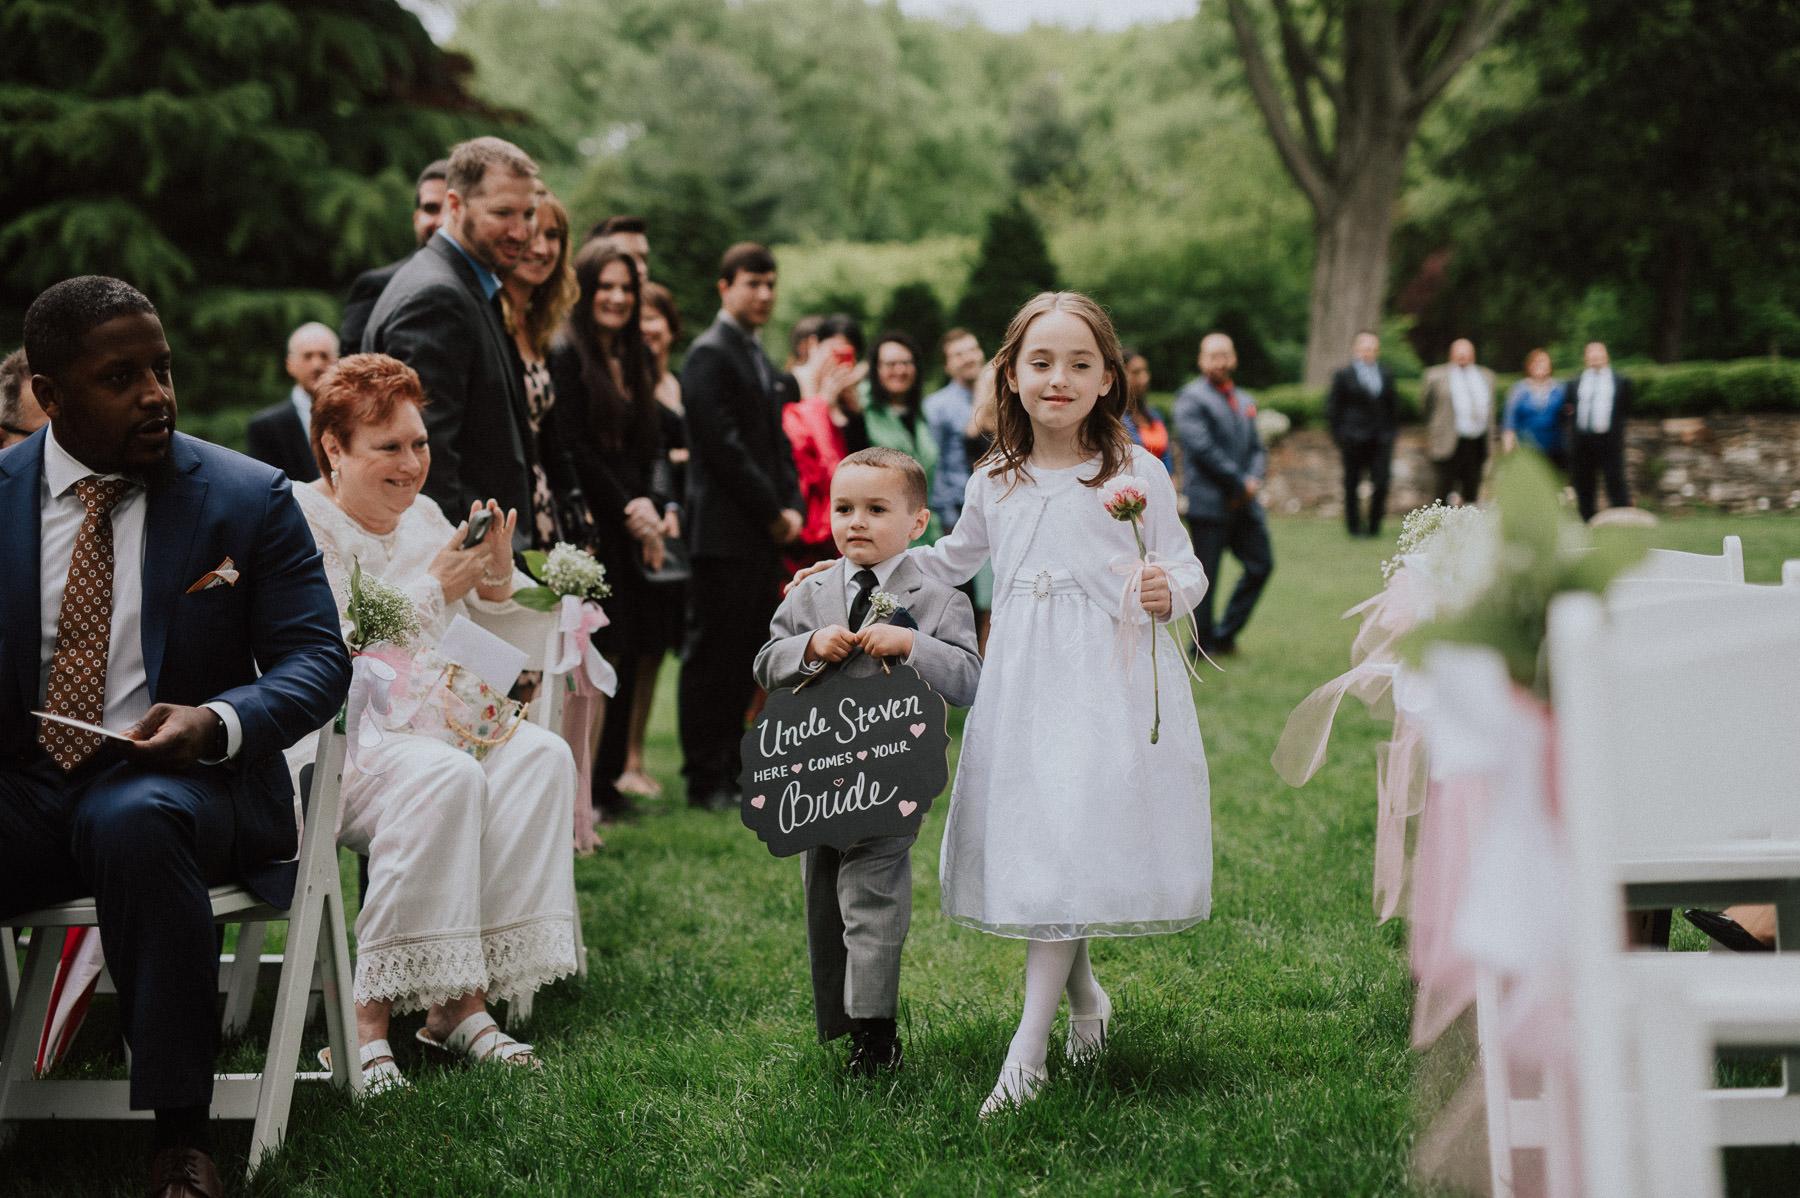 appleford-estate-wedding-photography-53.jpg